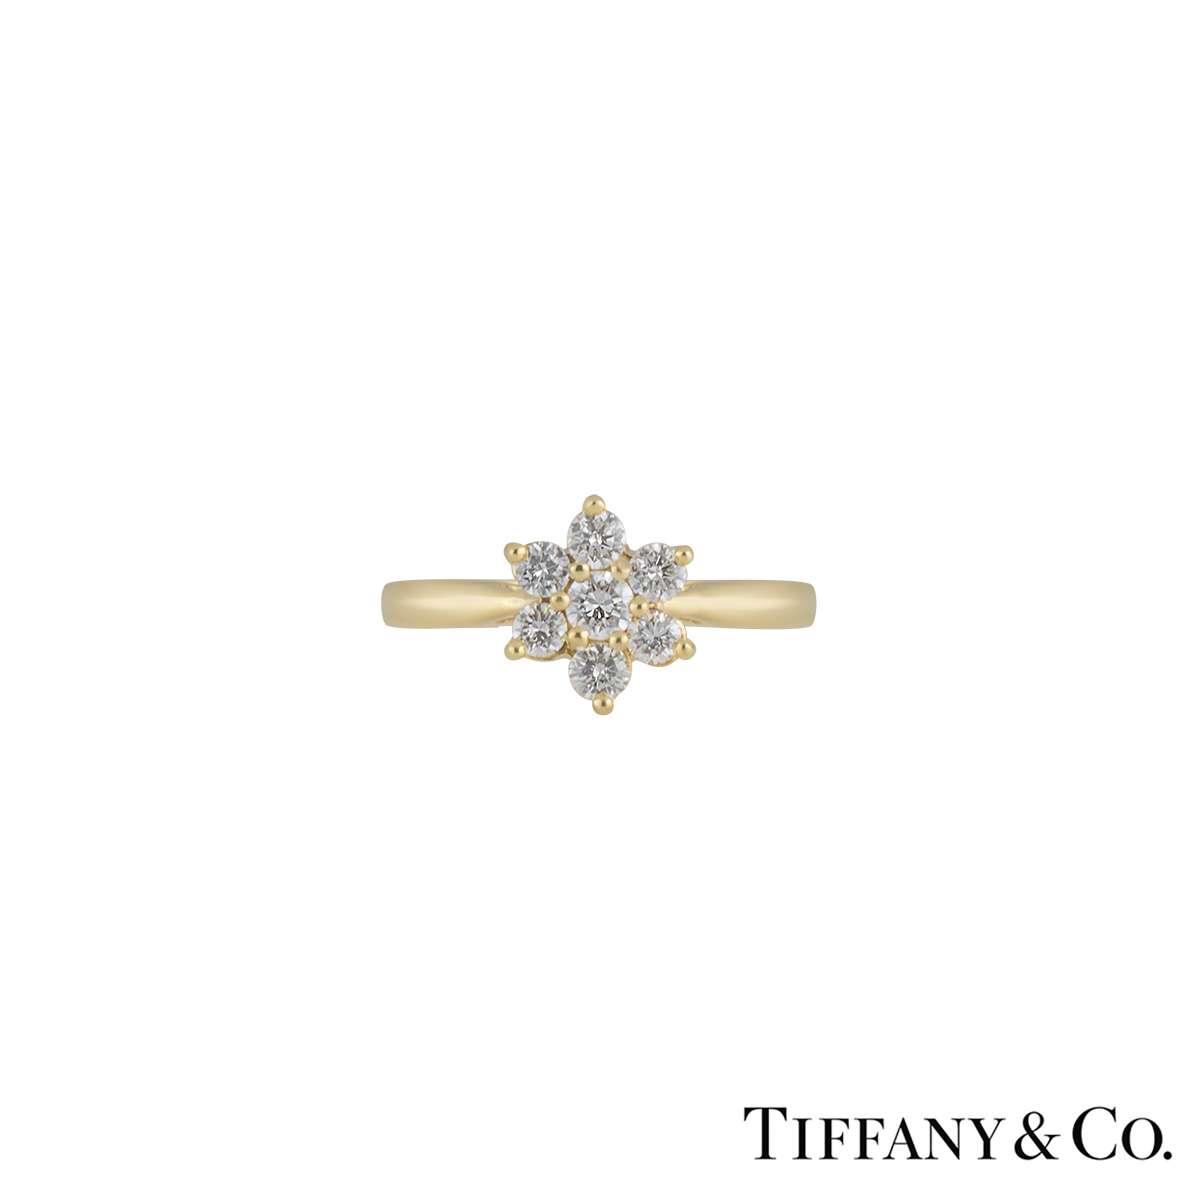 Tiffany & Co Yellow Gold Diamond Flower Ring 0.47ct